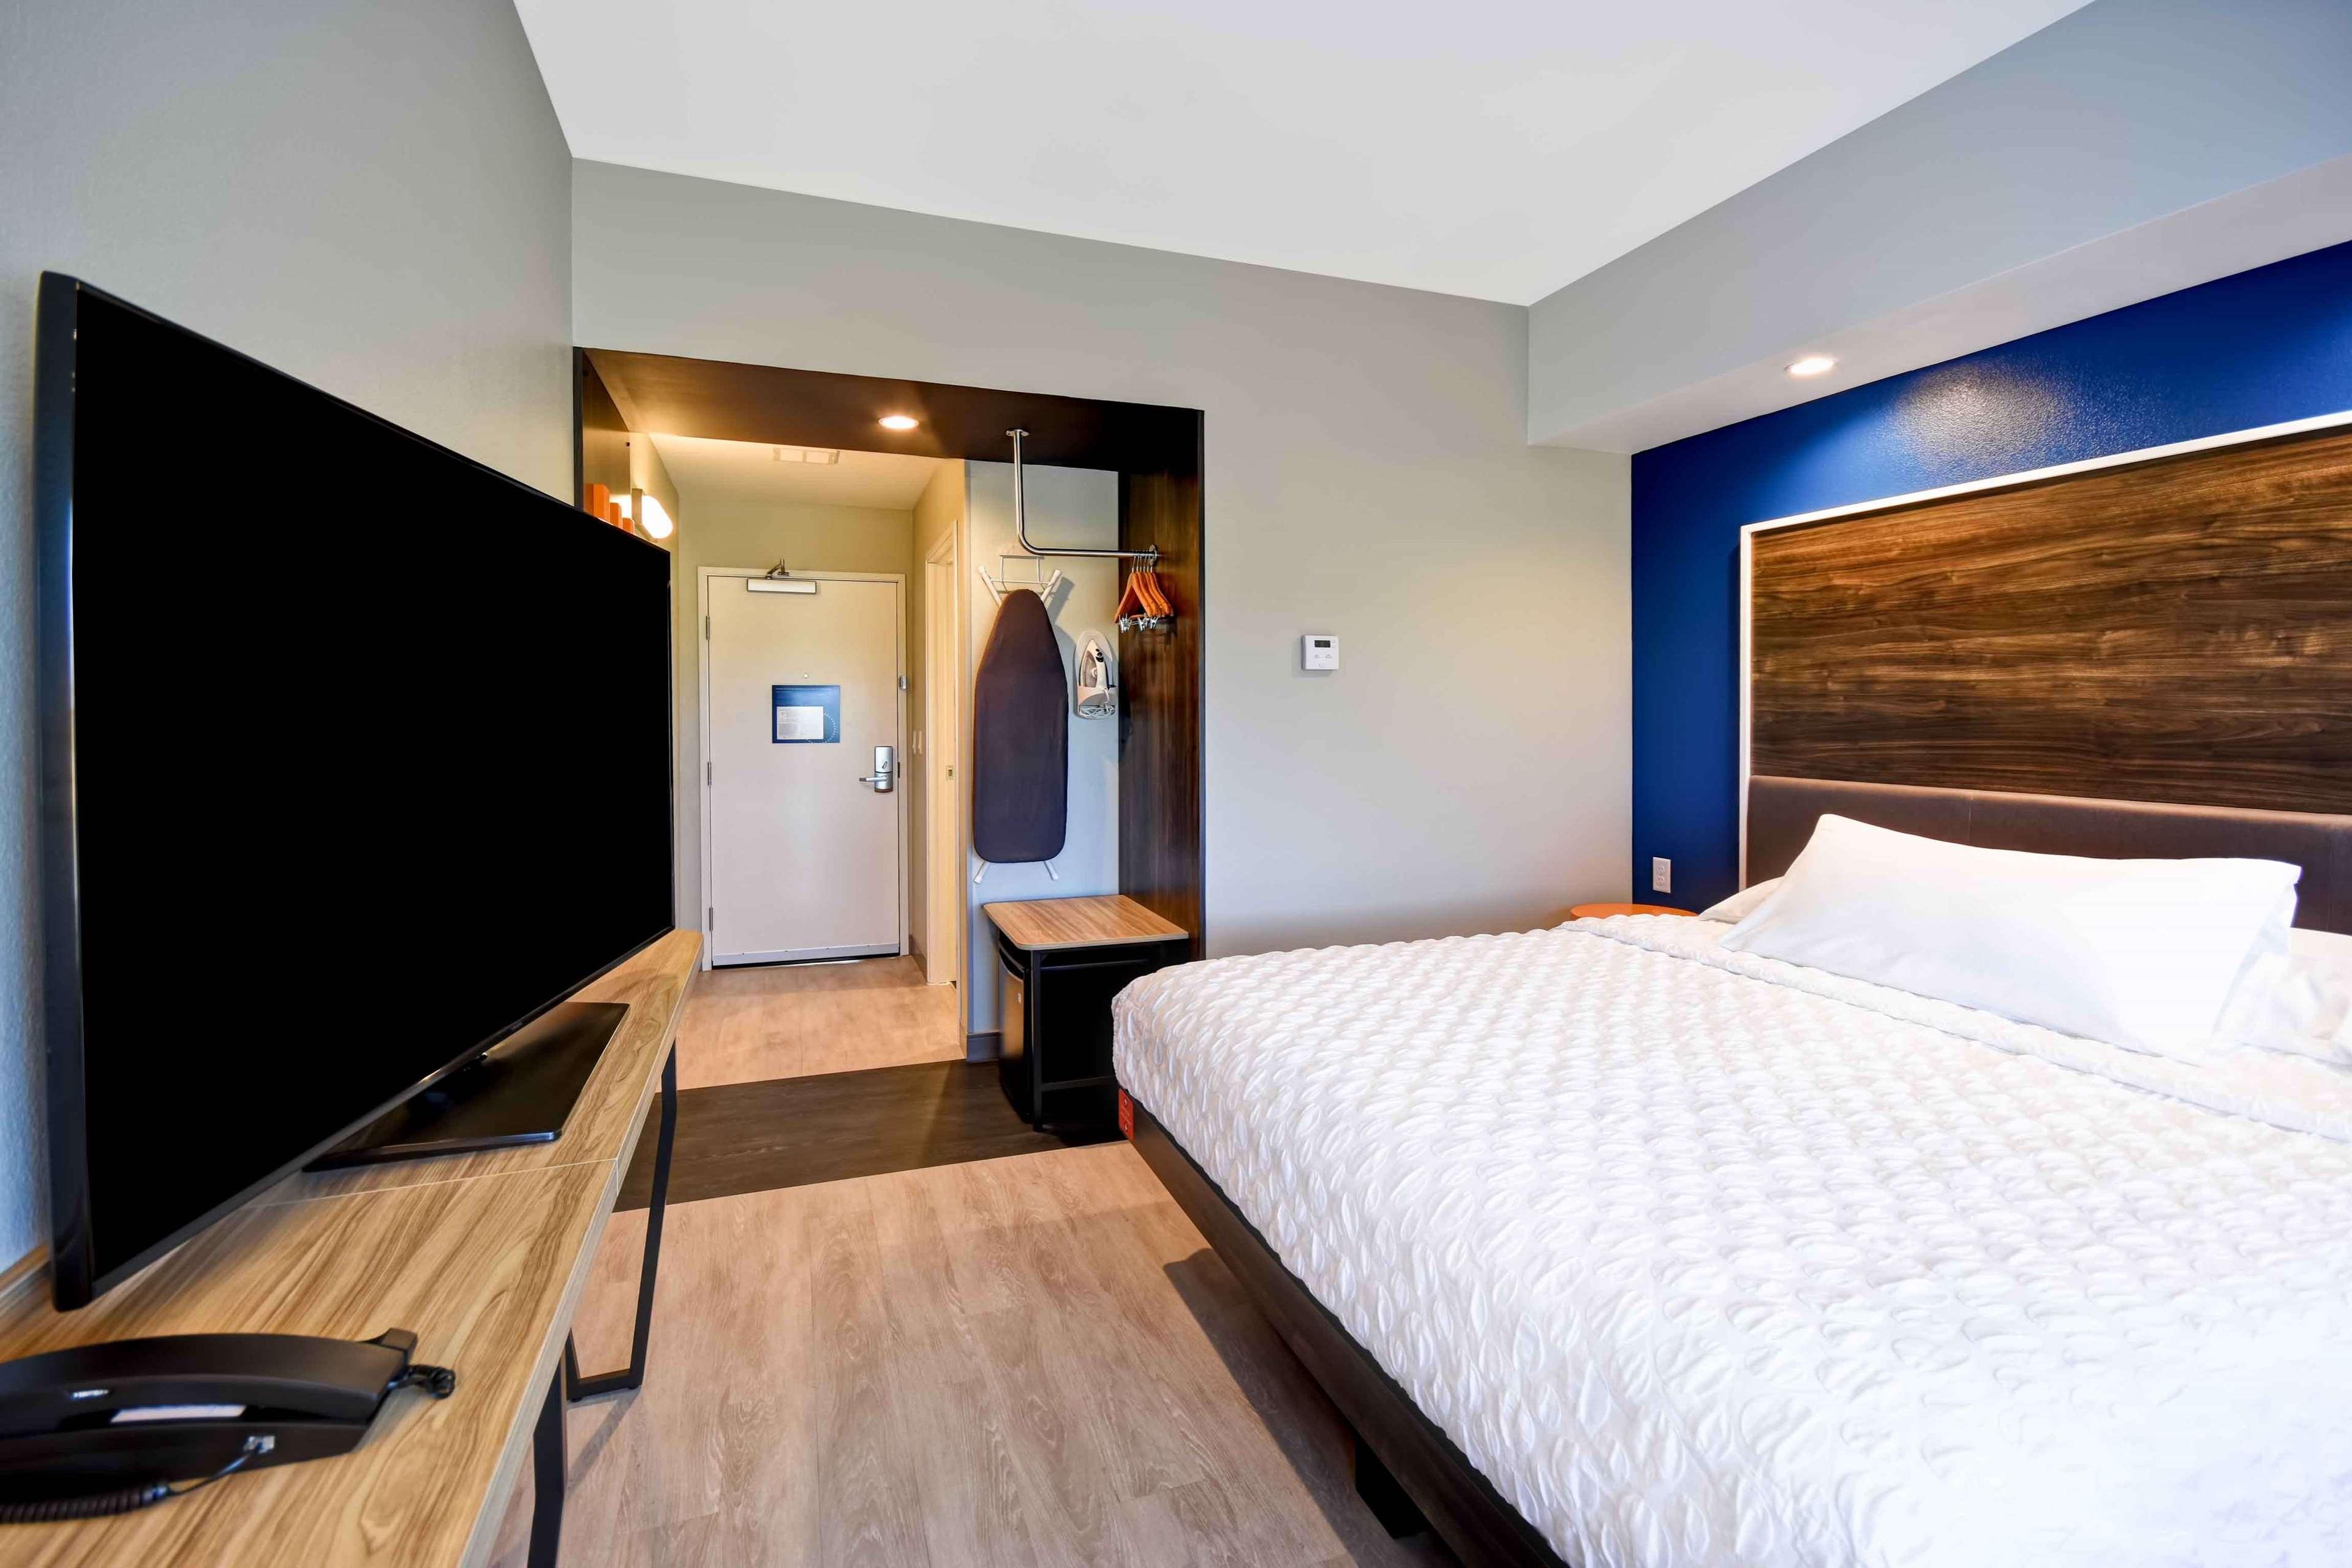 Tru by Hilton North Platte image 33